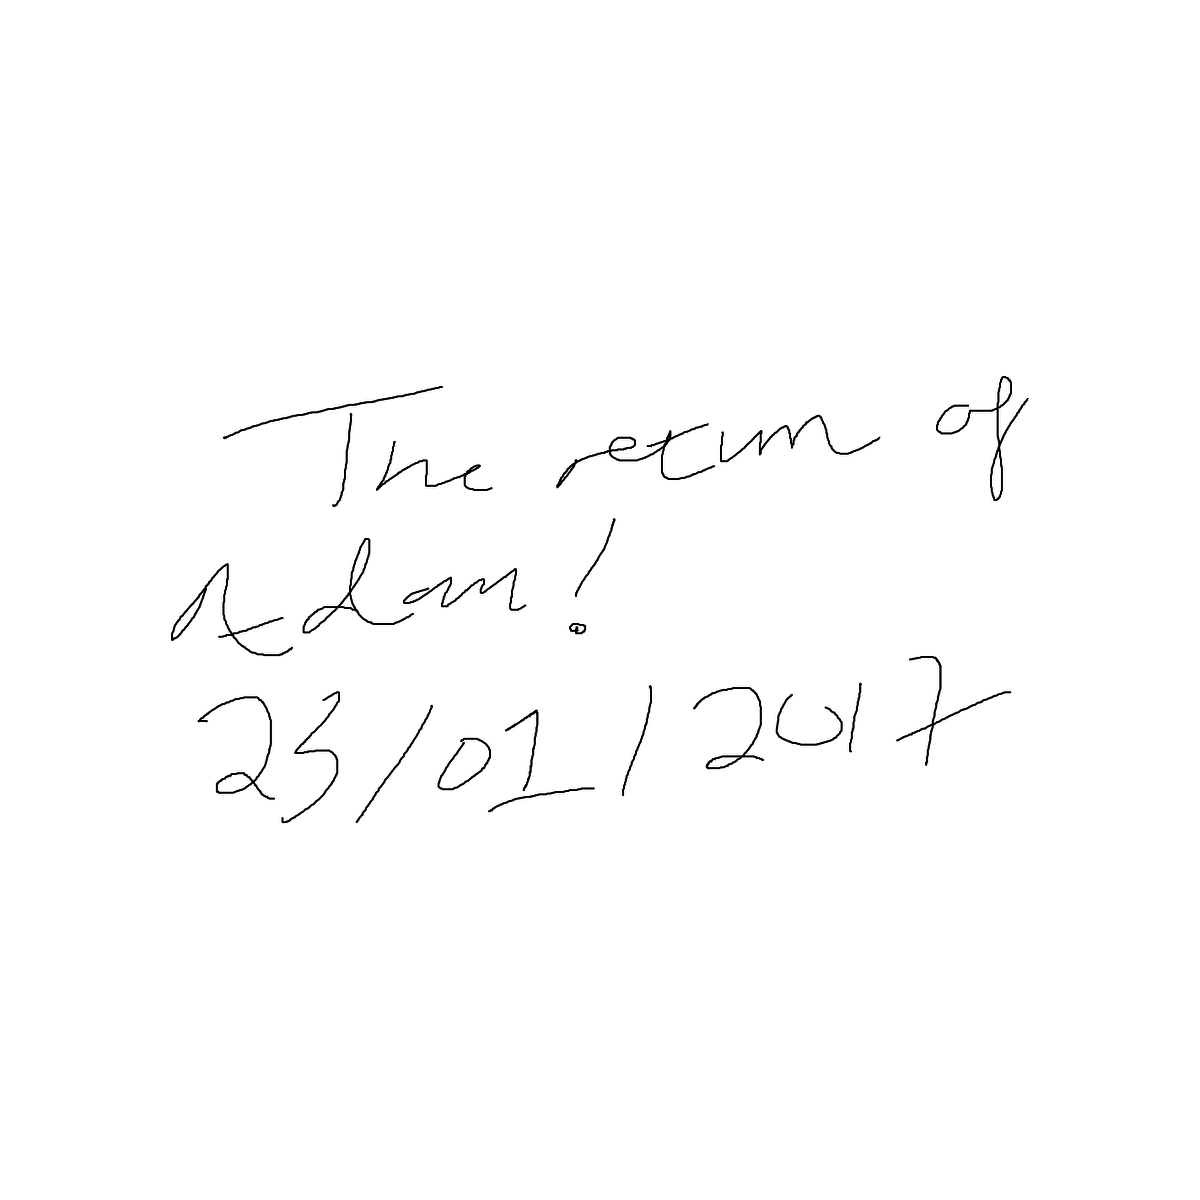 BAAAM drawing#23997 lat:52.4762229919433600lng: 13.4075374603271480